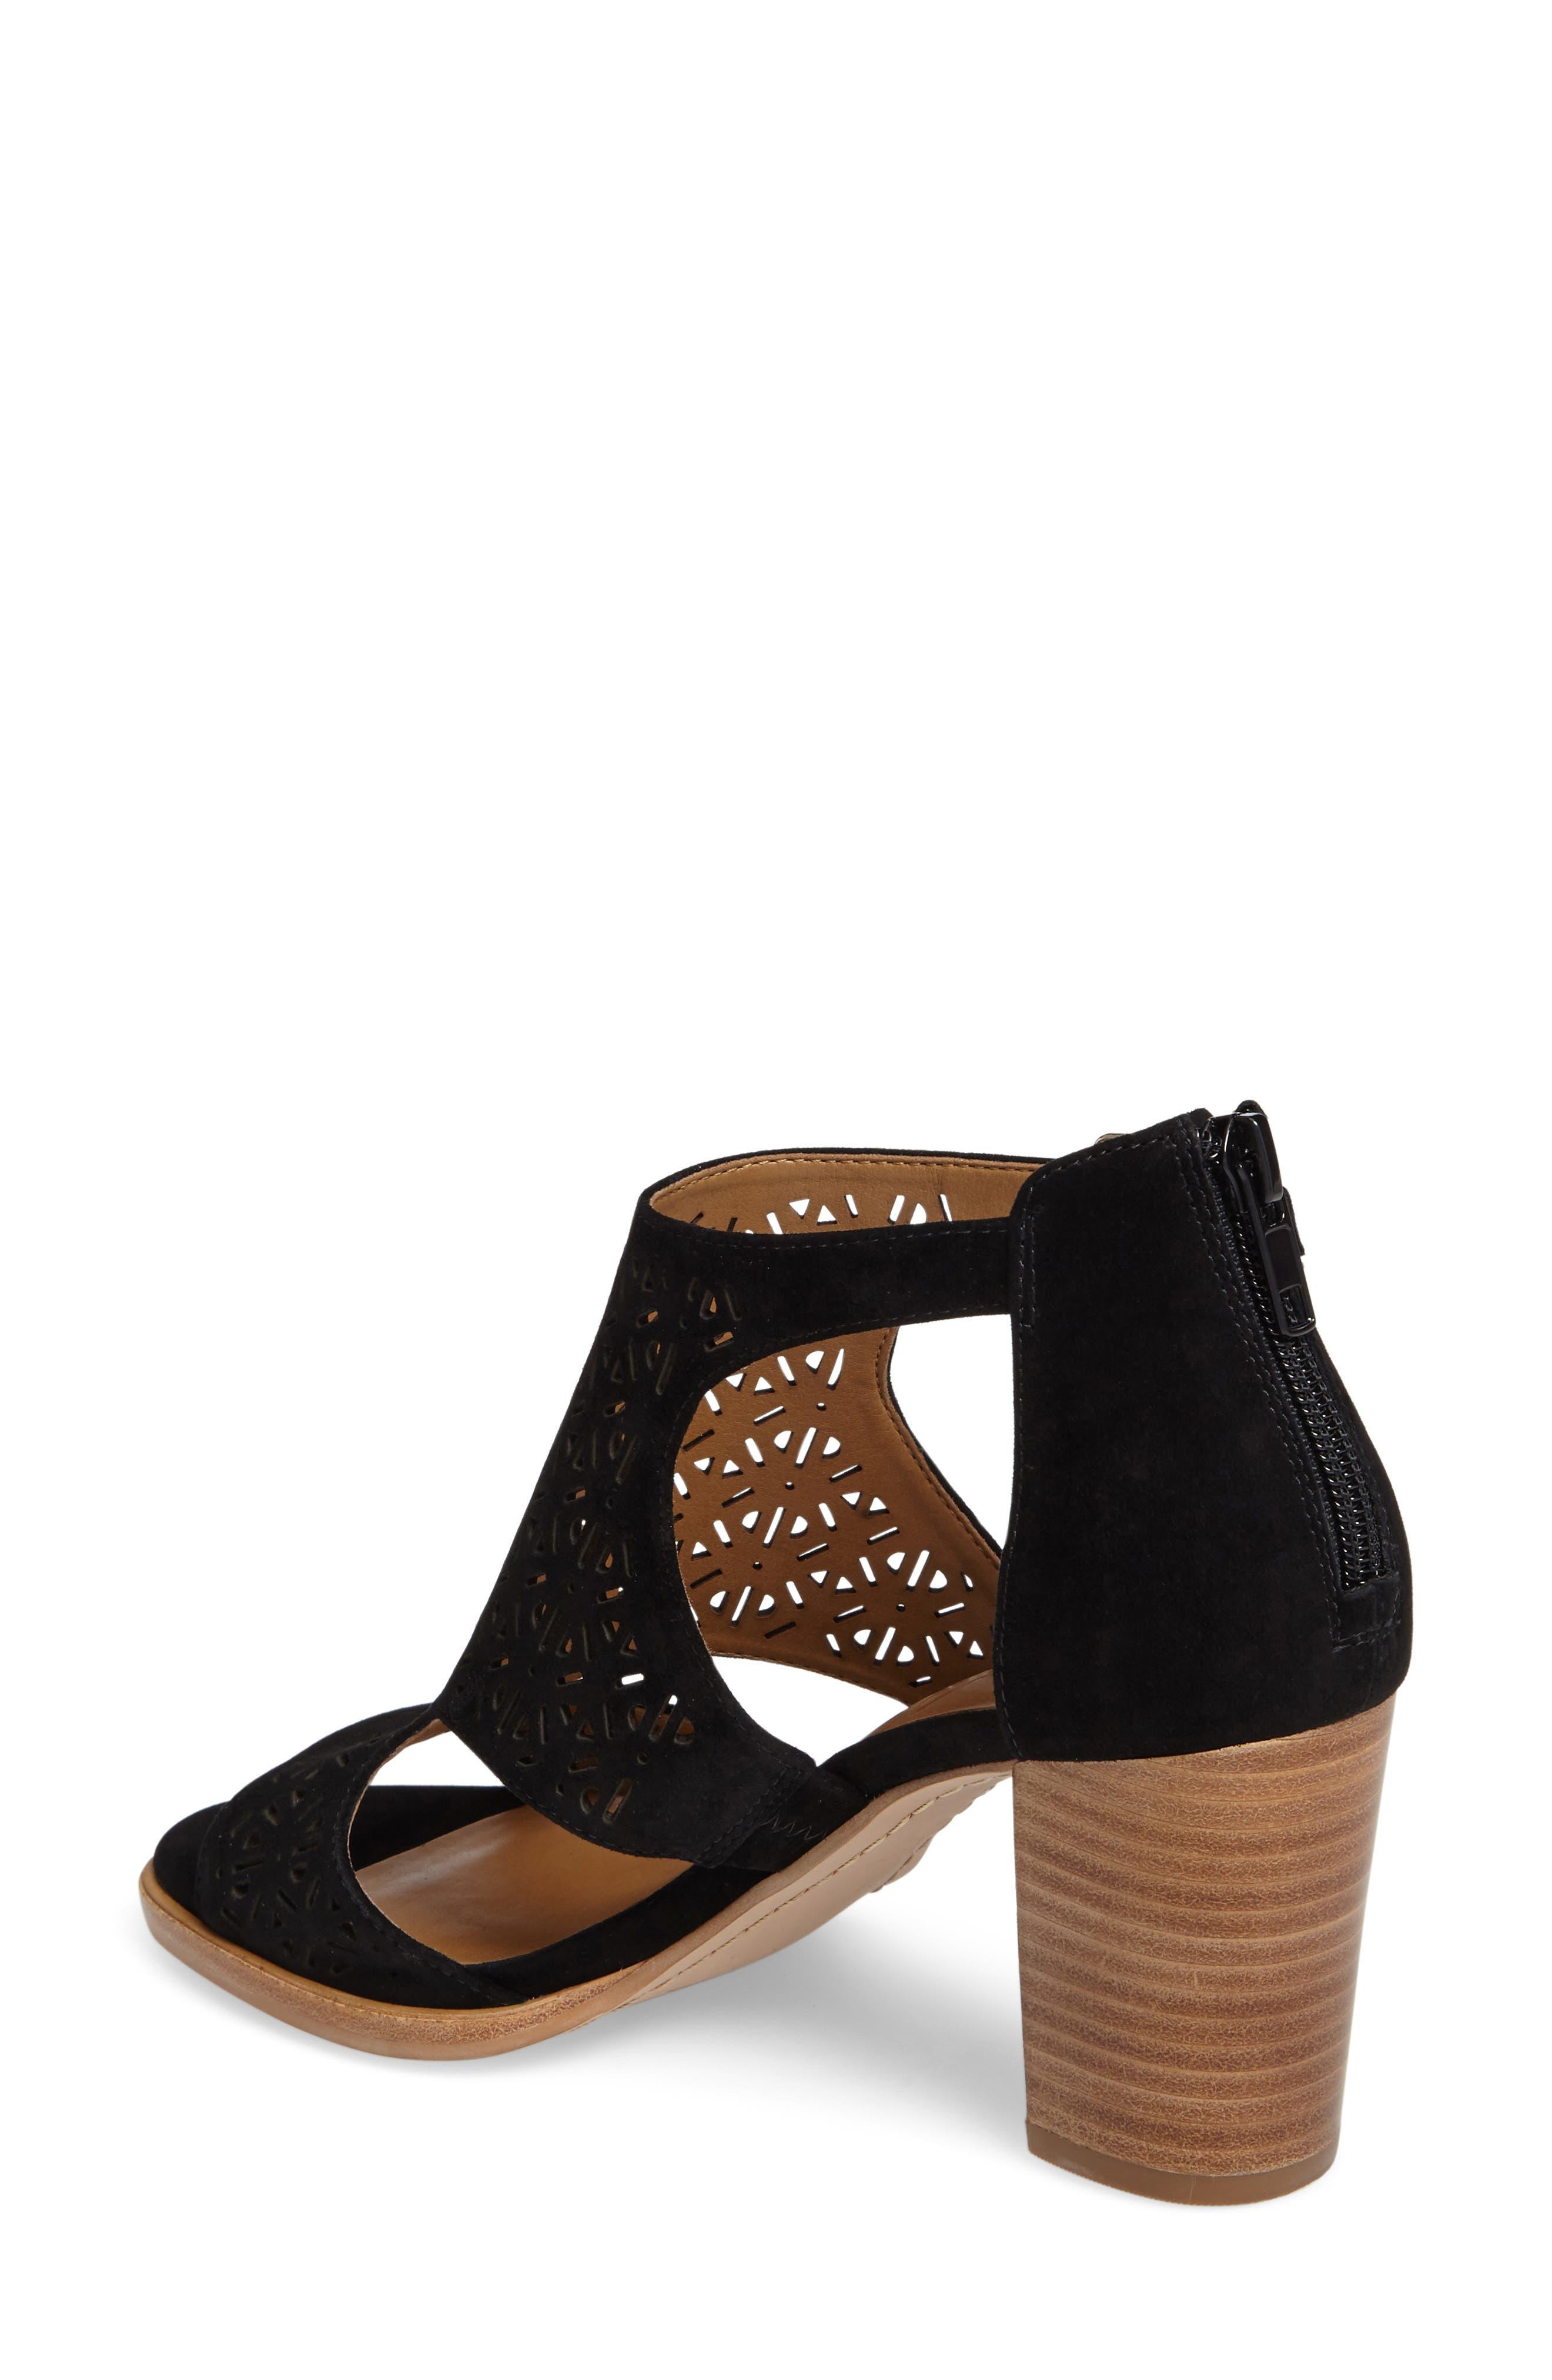 Edythe Block Heel Sandal,                             Alternate thumbnail 2, color,                             001